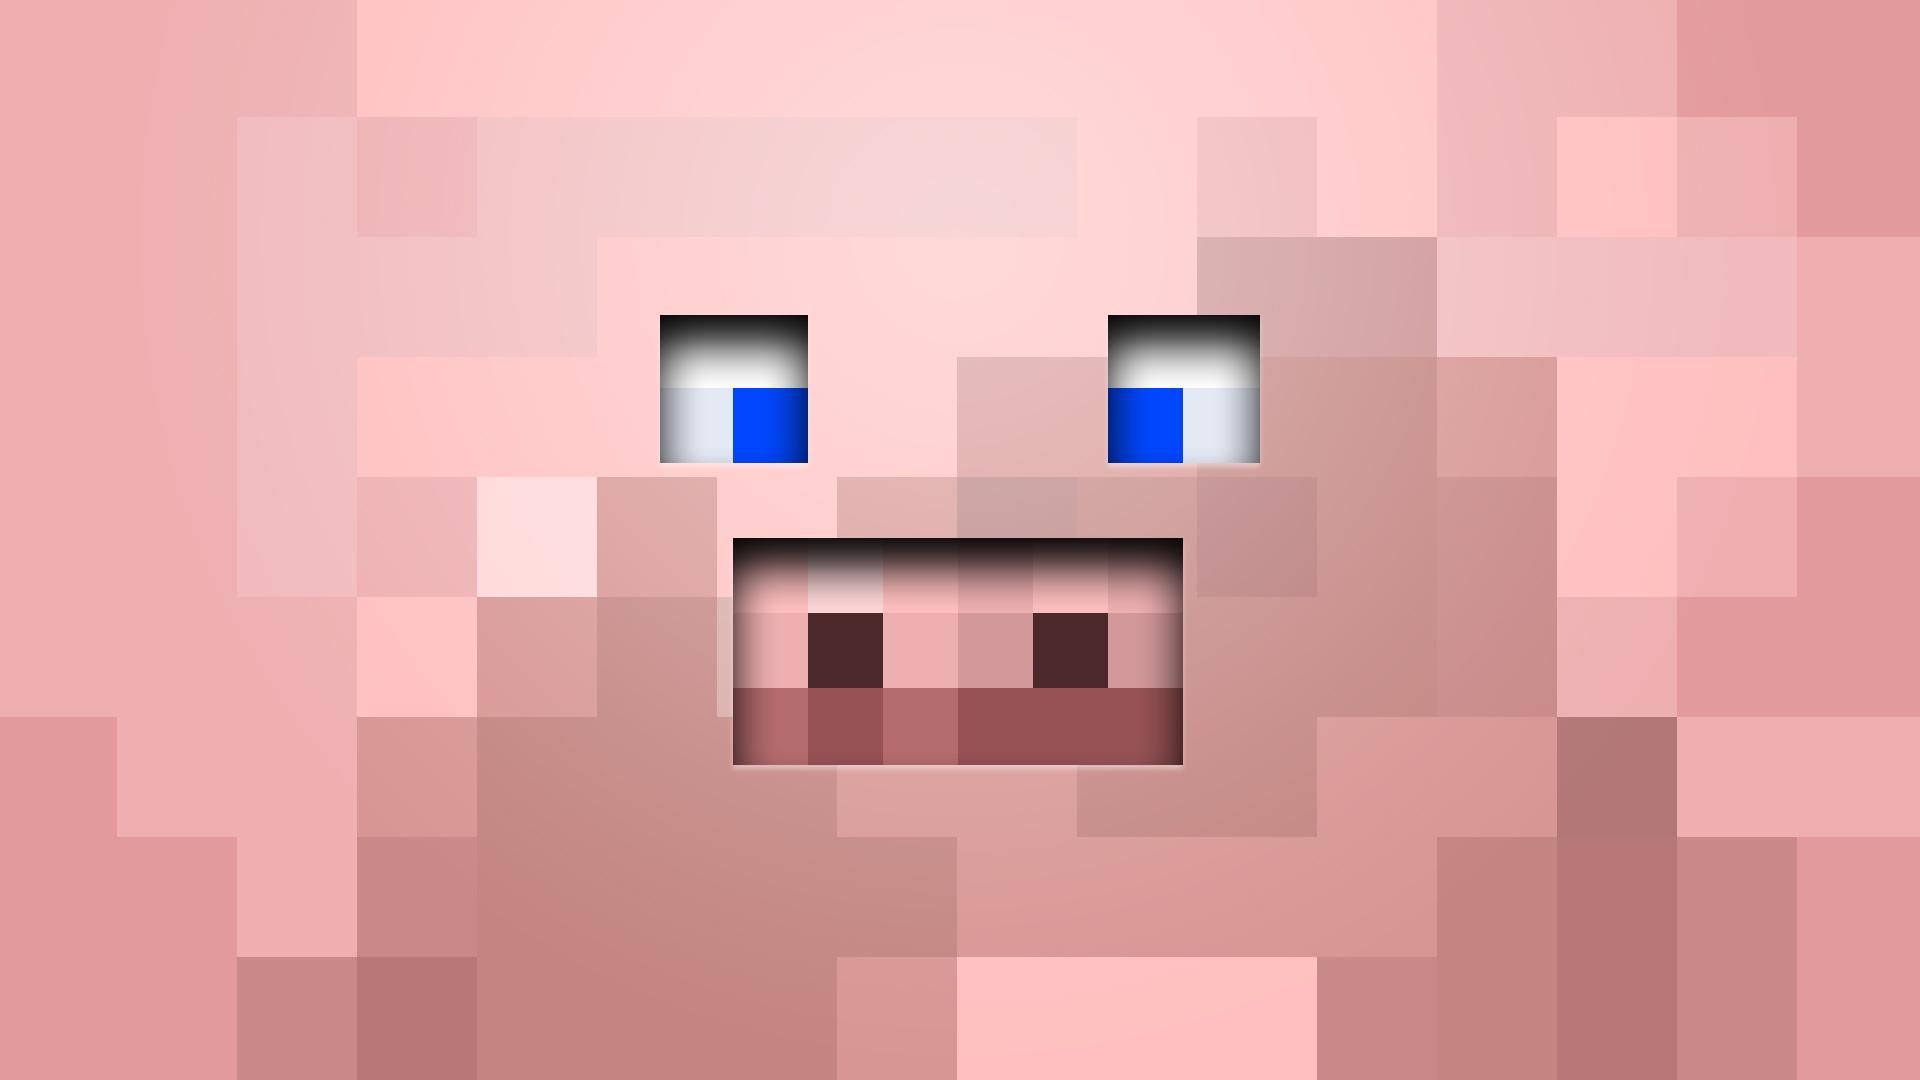 Free download Minecraft Pig Google Skins Minecraft Pig Google